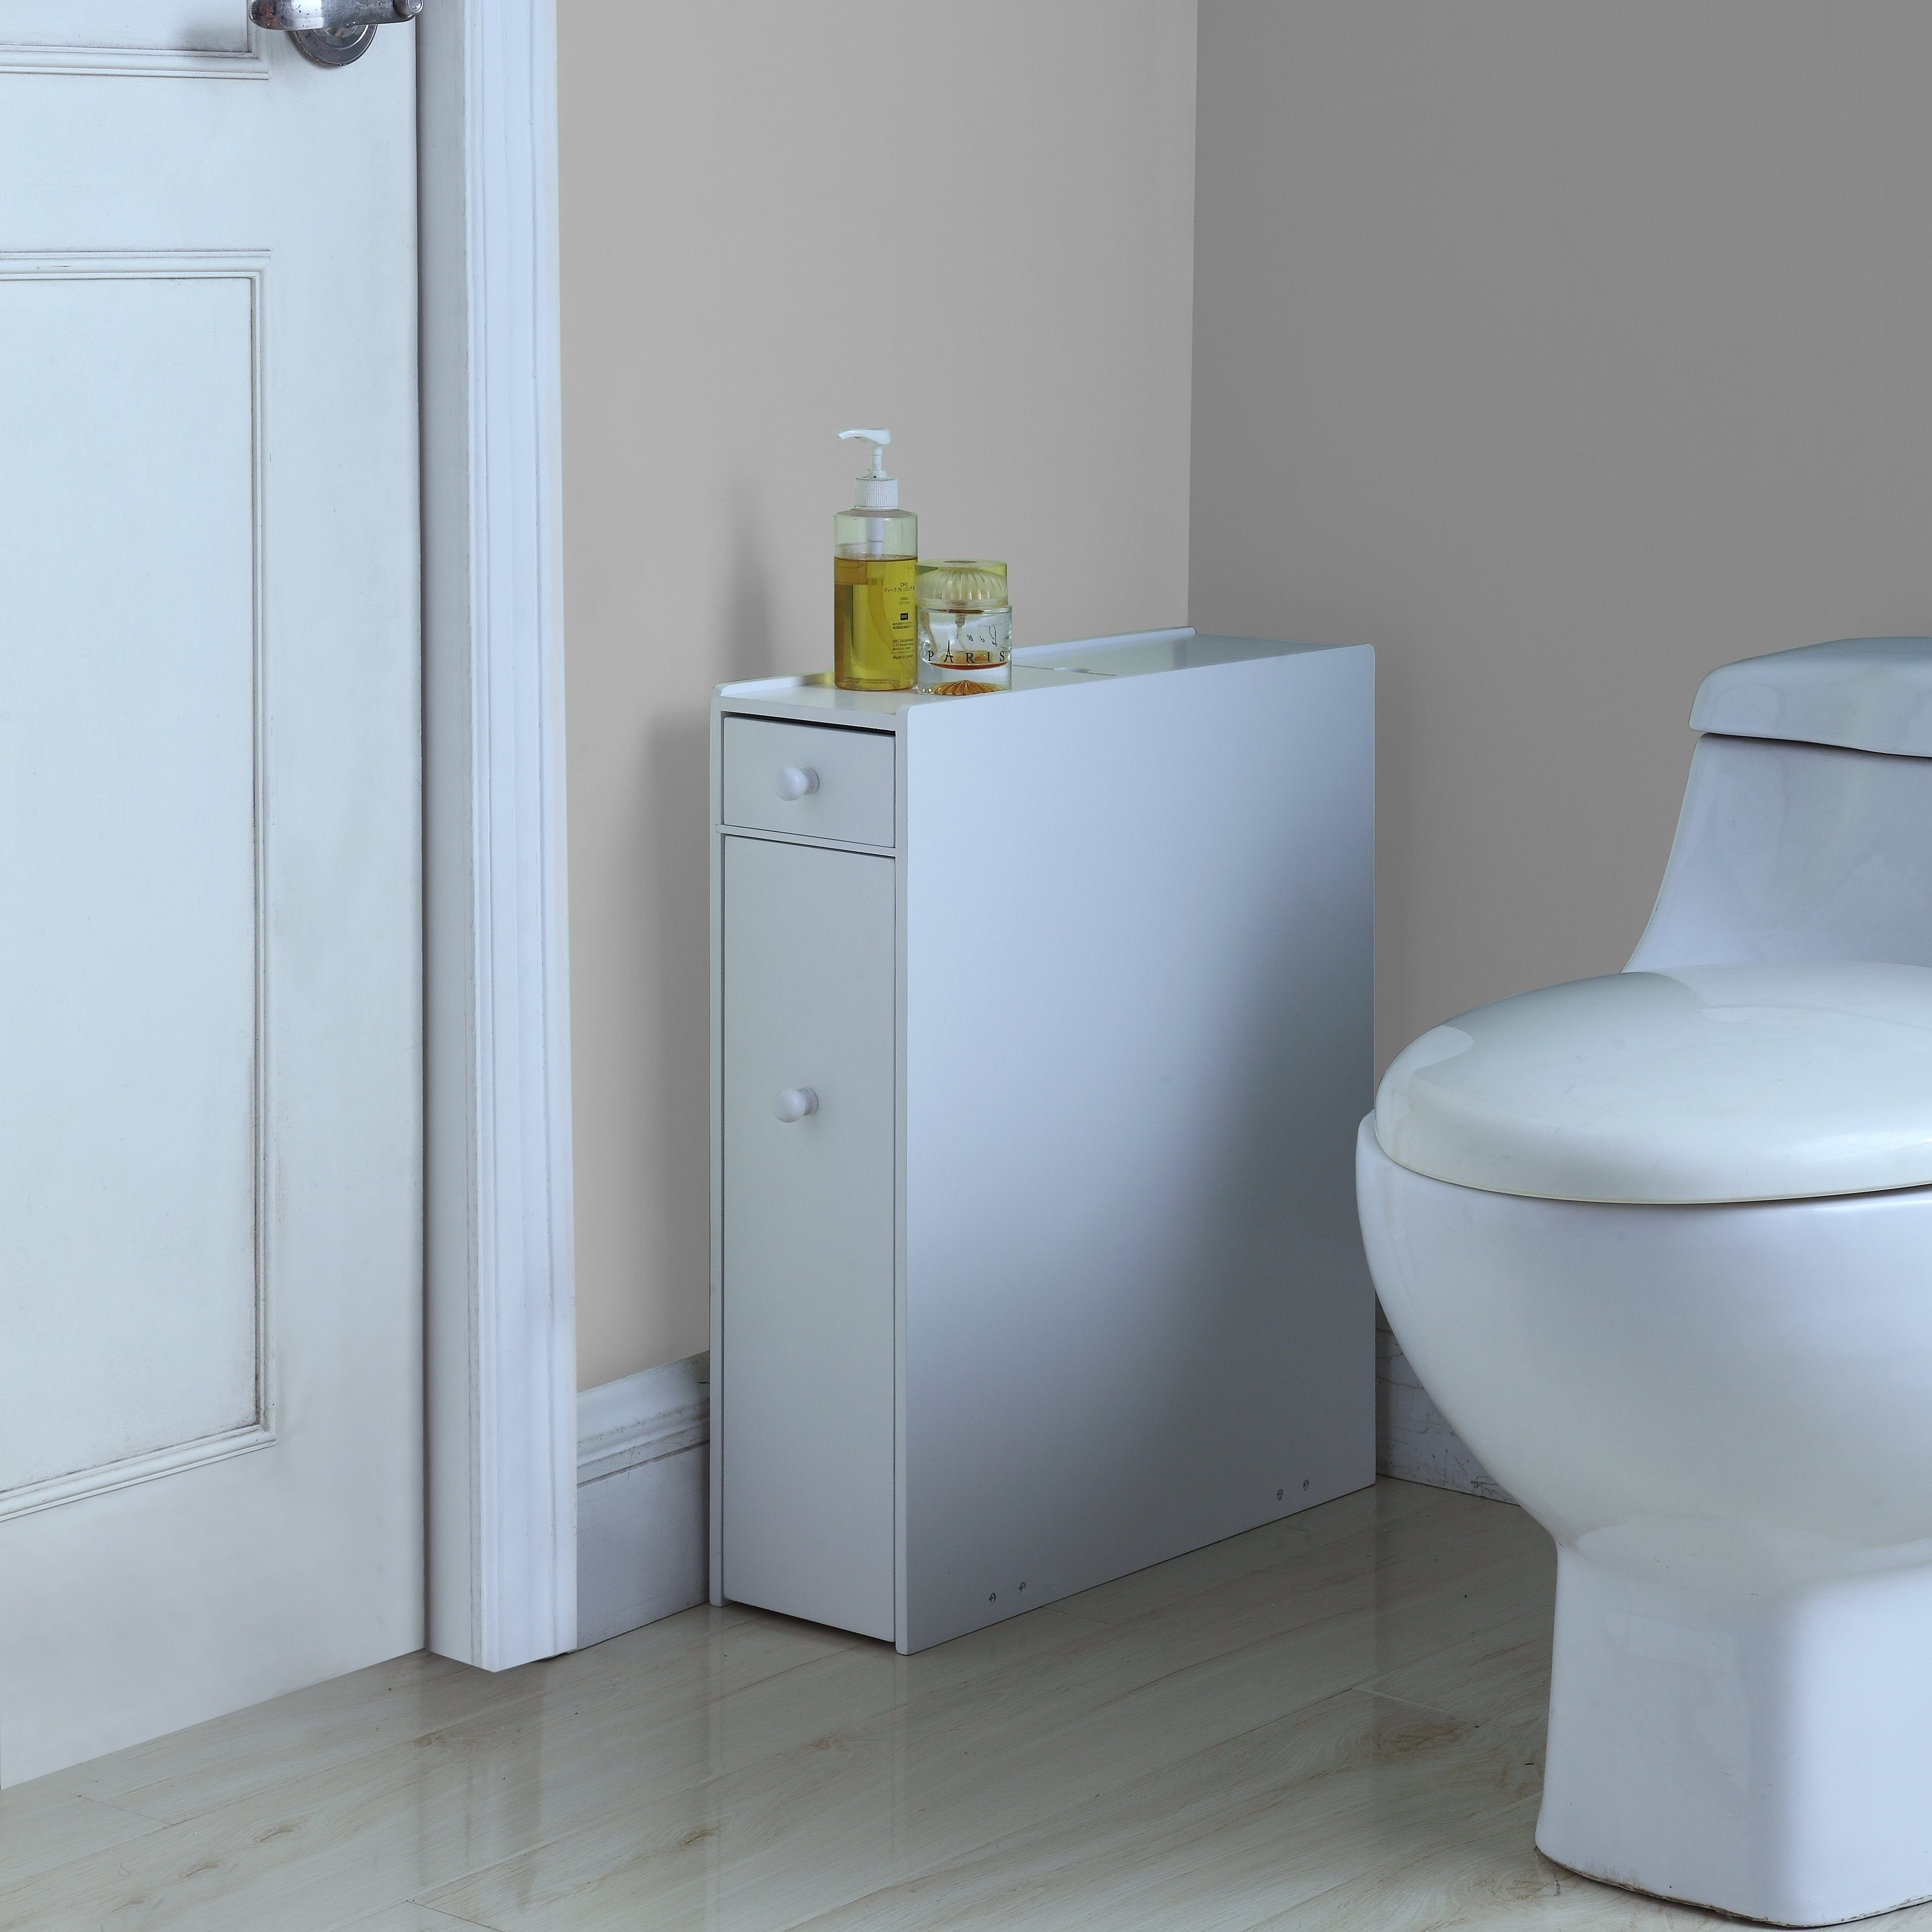 Floor Cabinet Bathroom Furniture | Find Great Furniture Deals ...